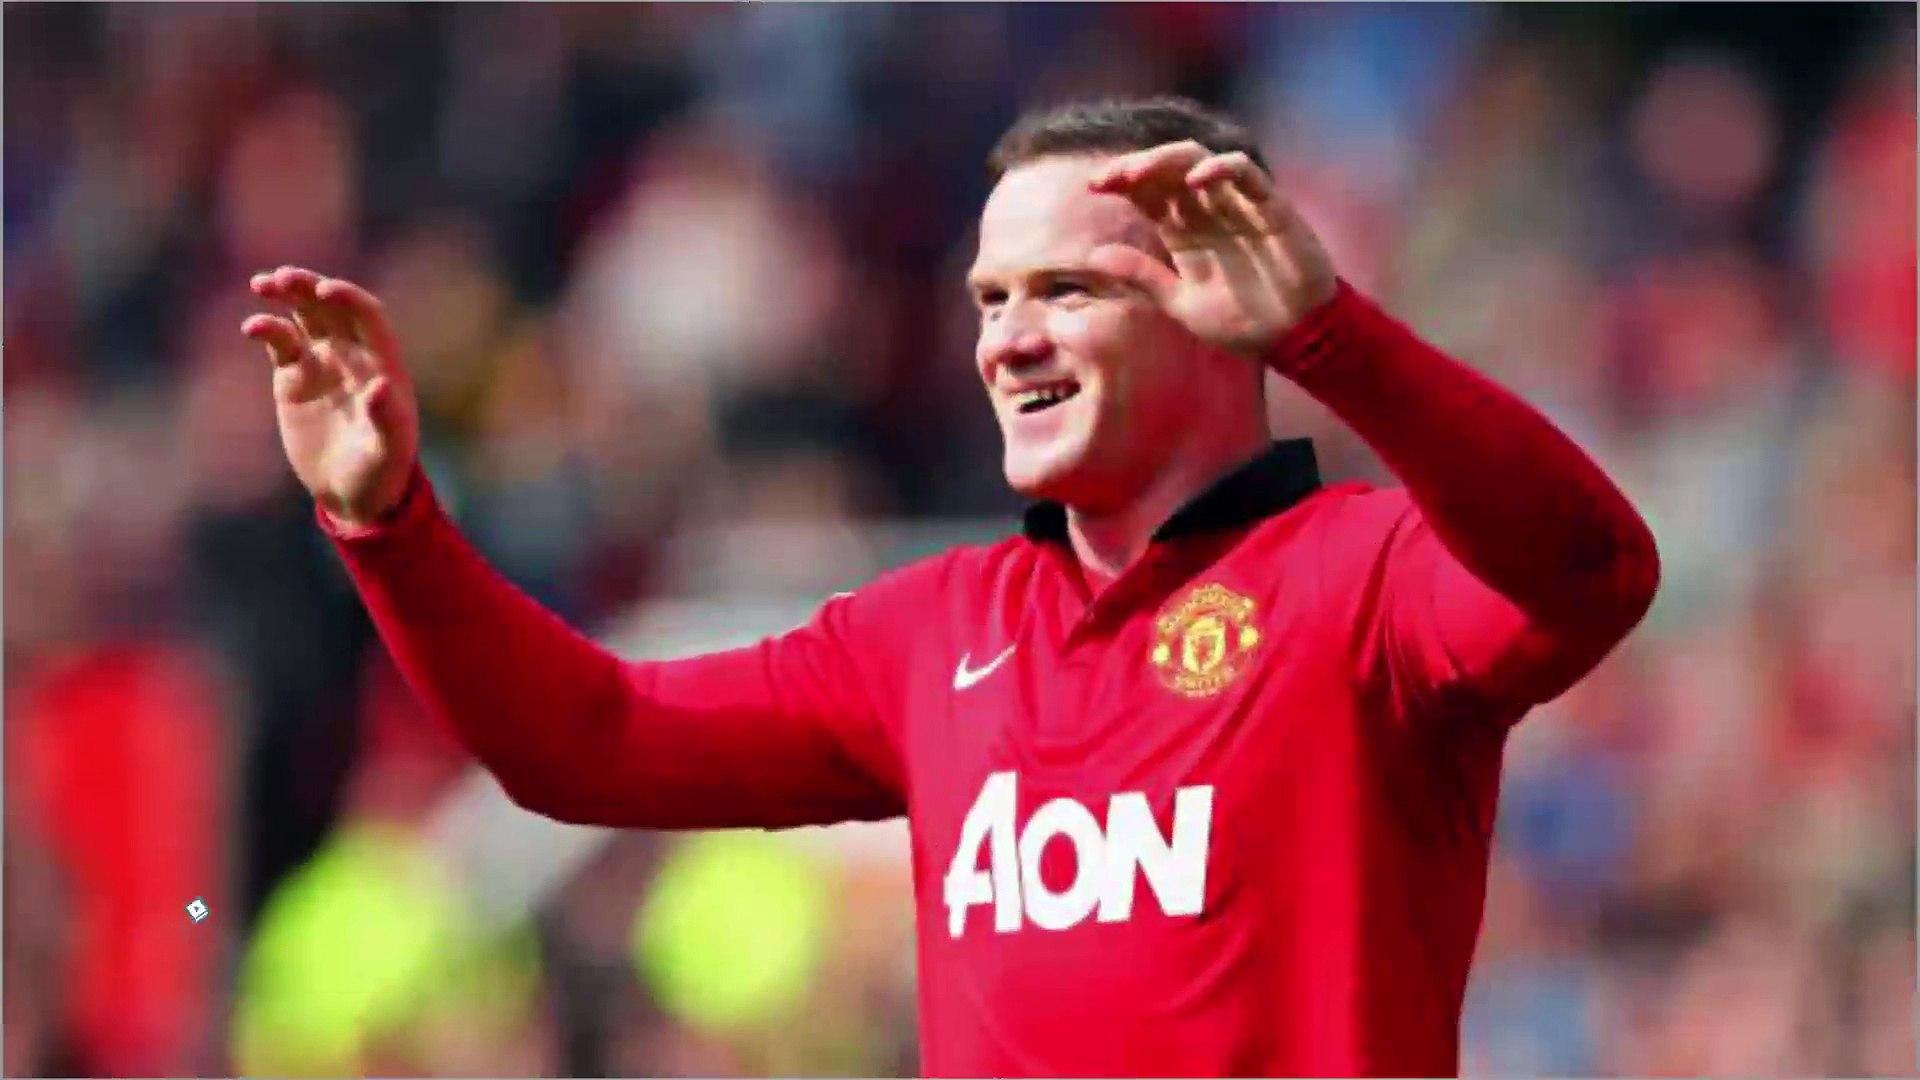 Wayne Rooney: Manchester United players 'fighting' for Louis van Gaal